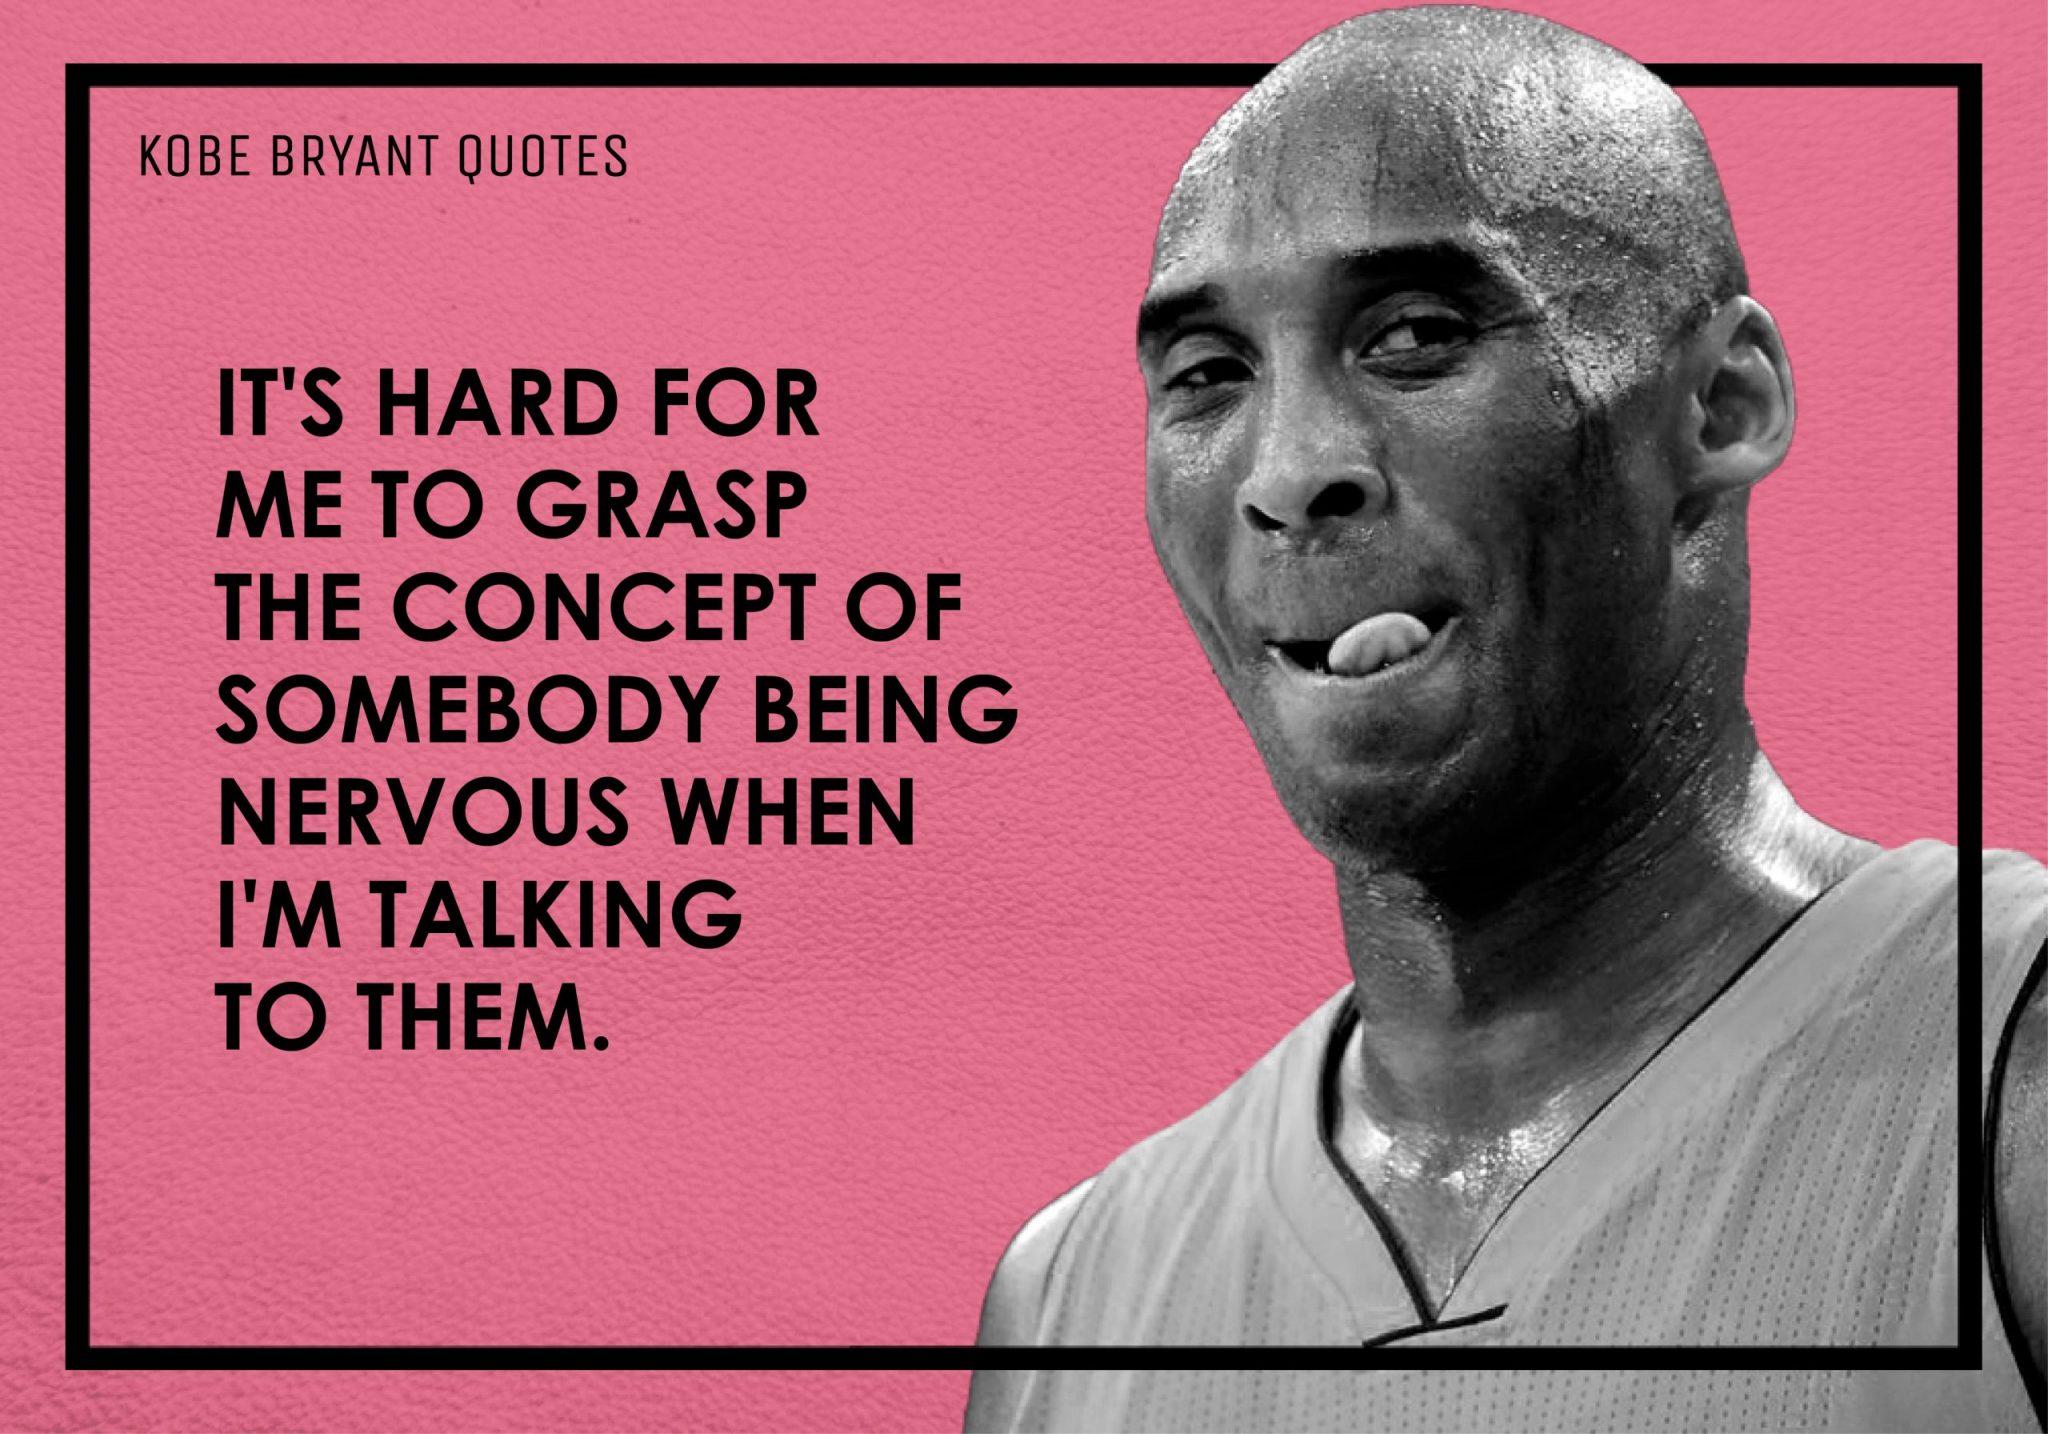 Kobe Bryant Quotes (13)